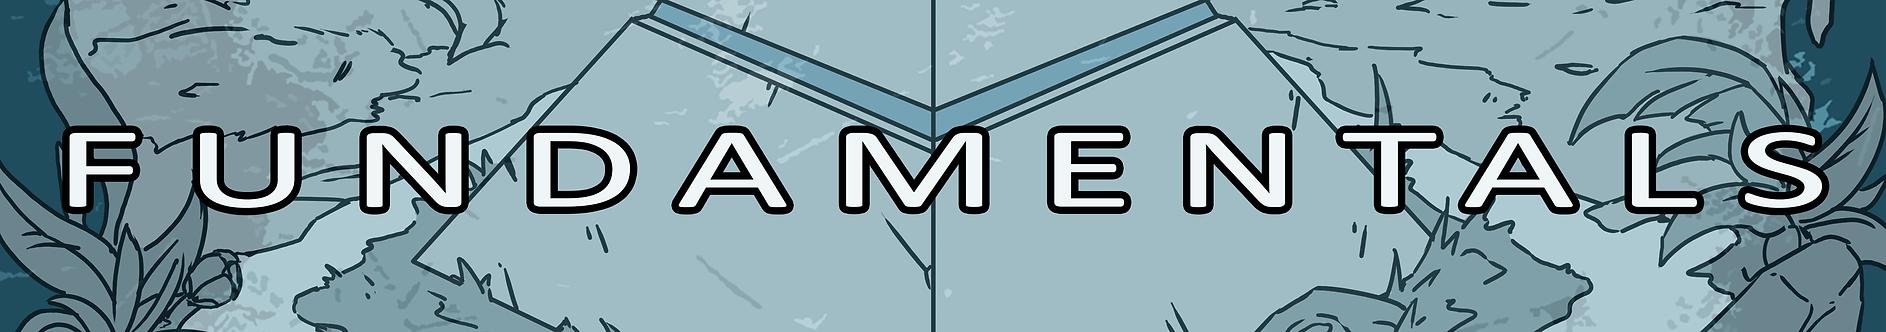 Fundamentals Merch Banner_01.png